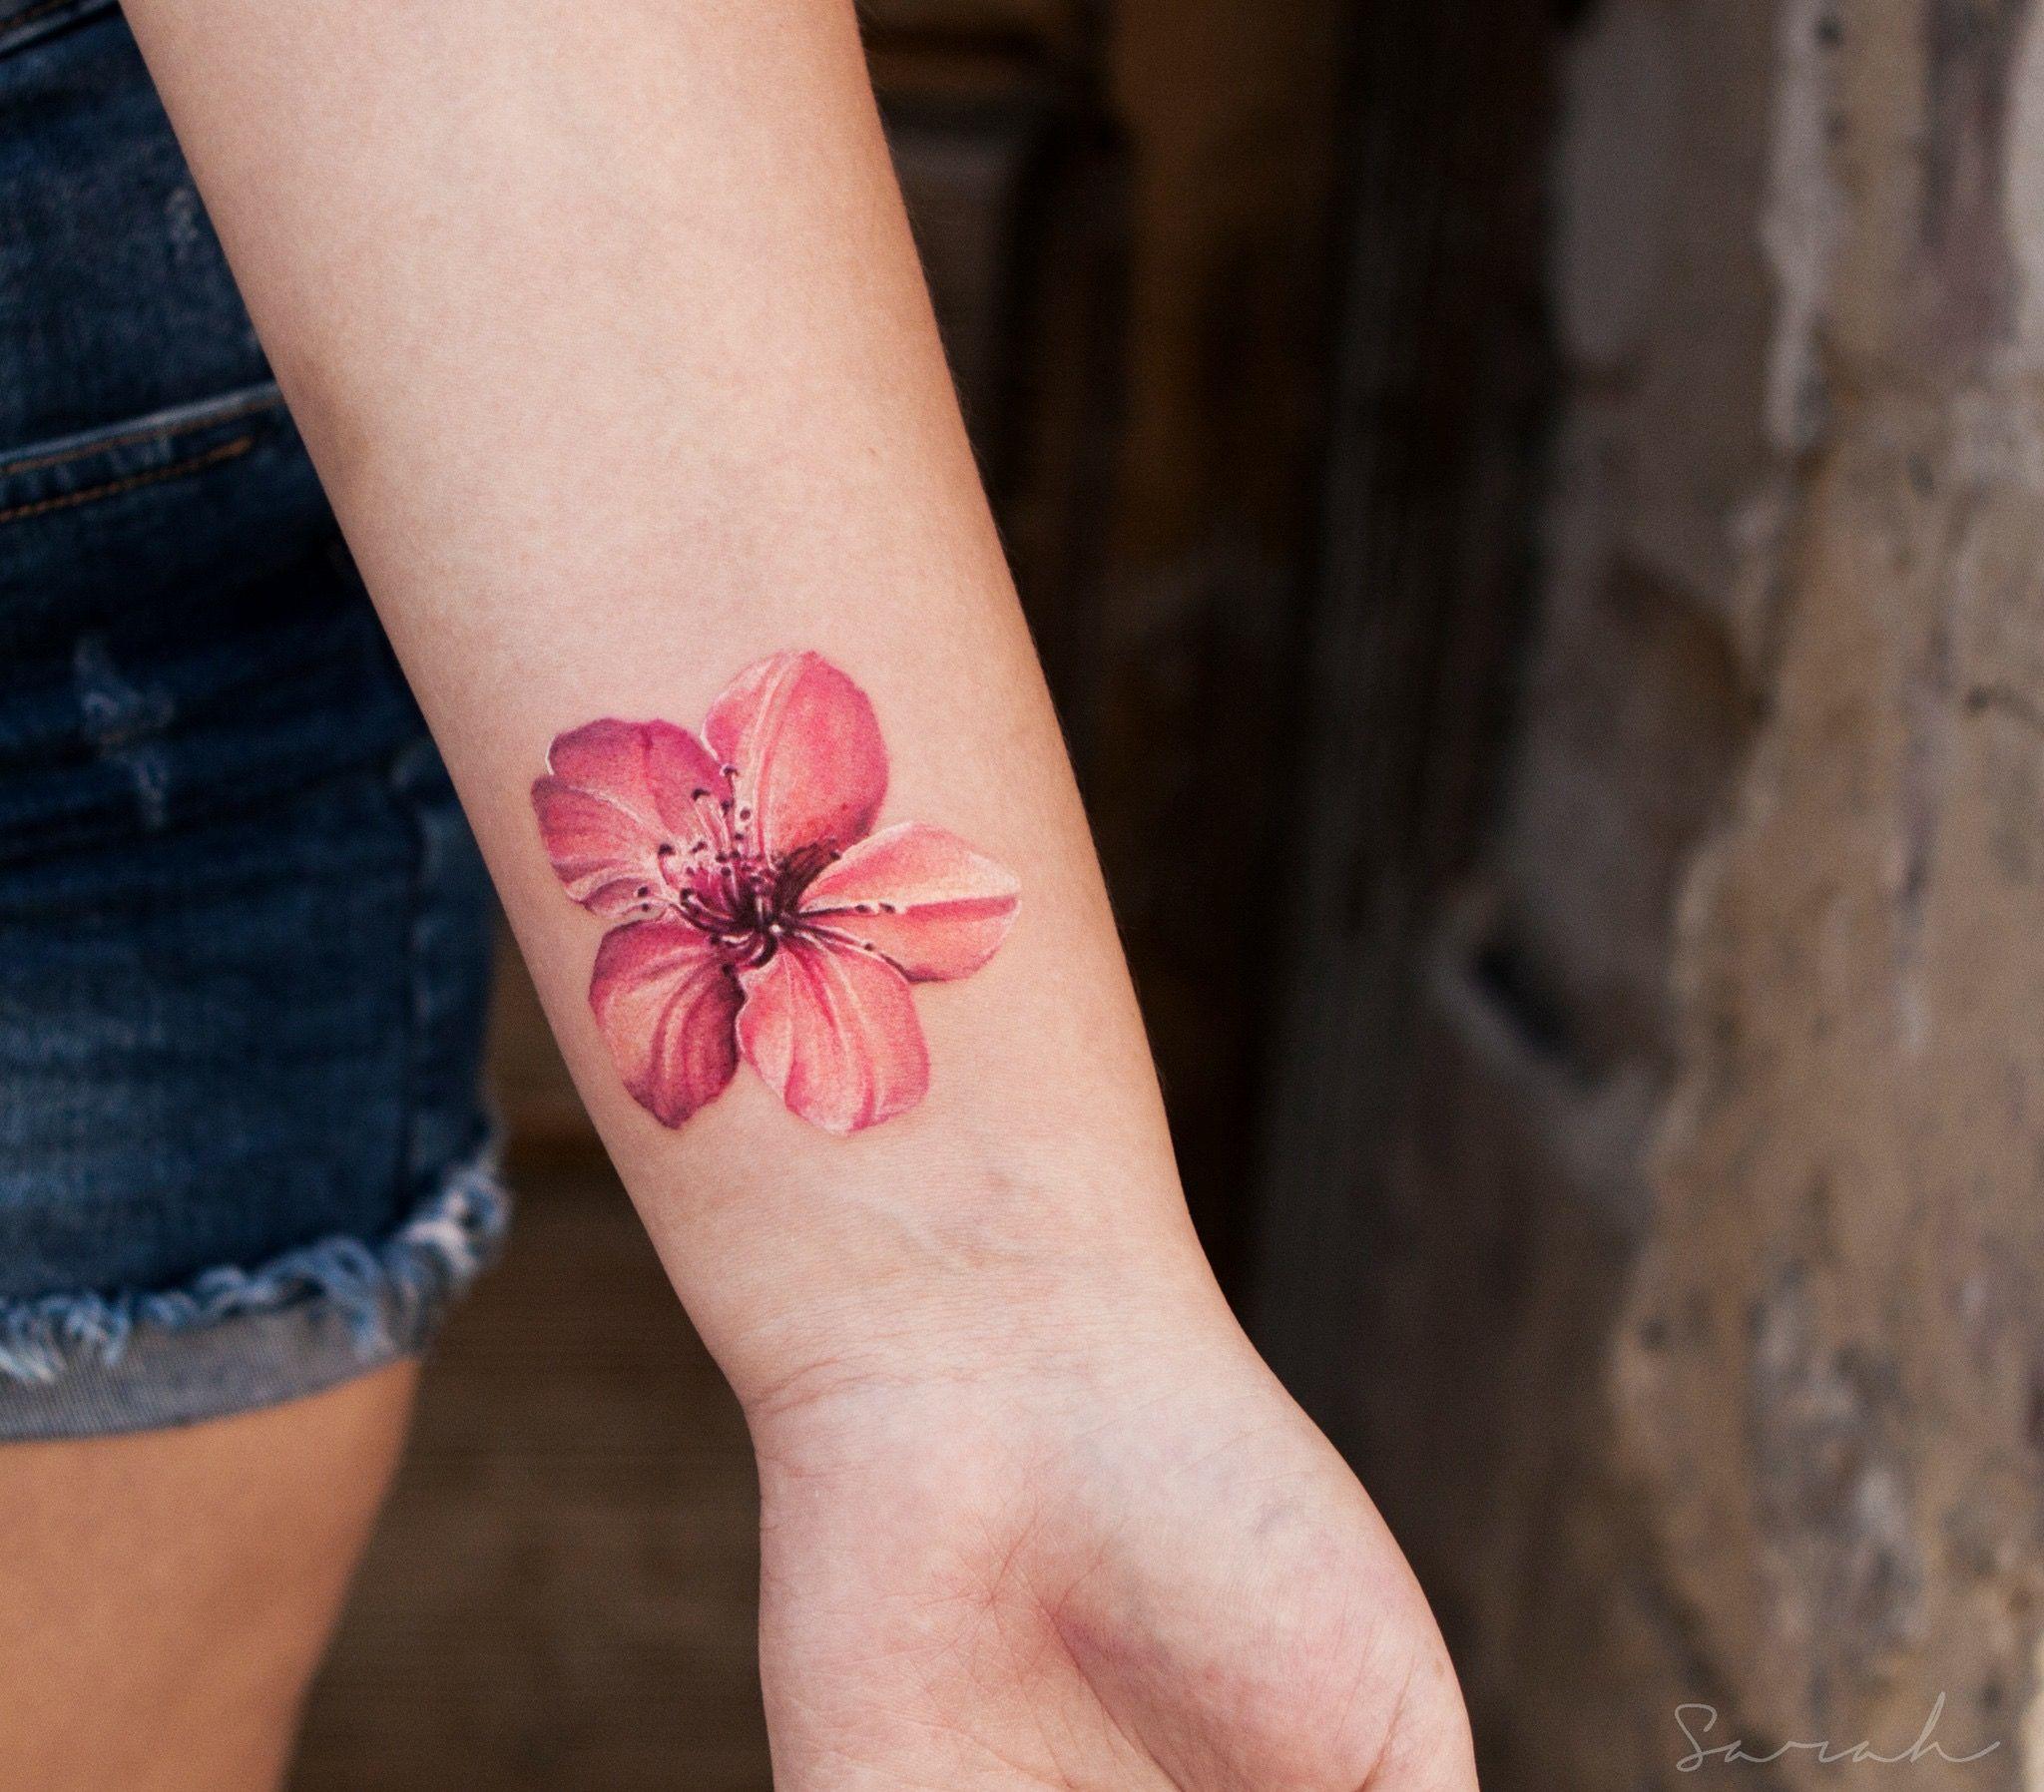 Pin By Jazmyn Danko On Hibiscus Tattoo In 2020 Hawaiian Flower Tattoos Hibiscus Tattoo Frangipani Tattoo